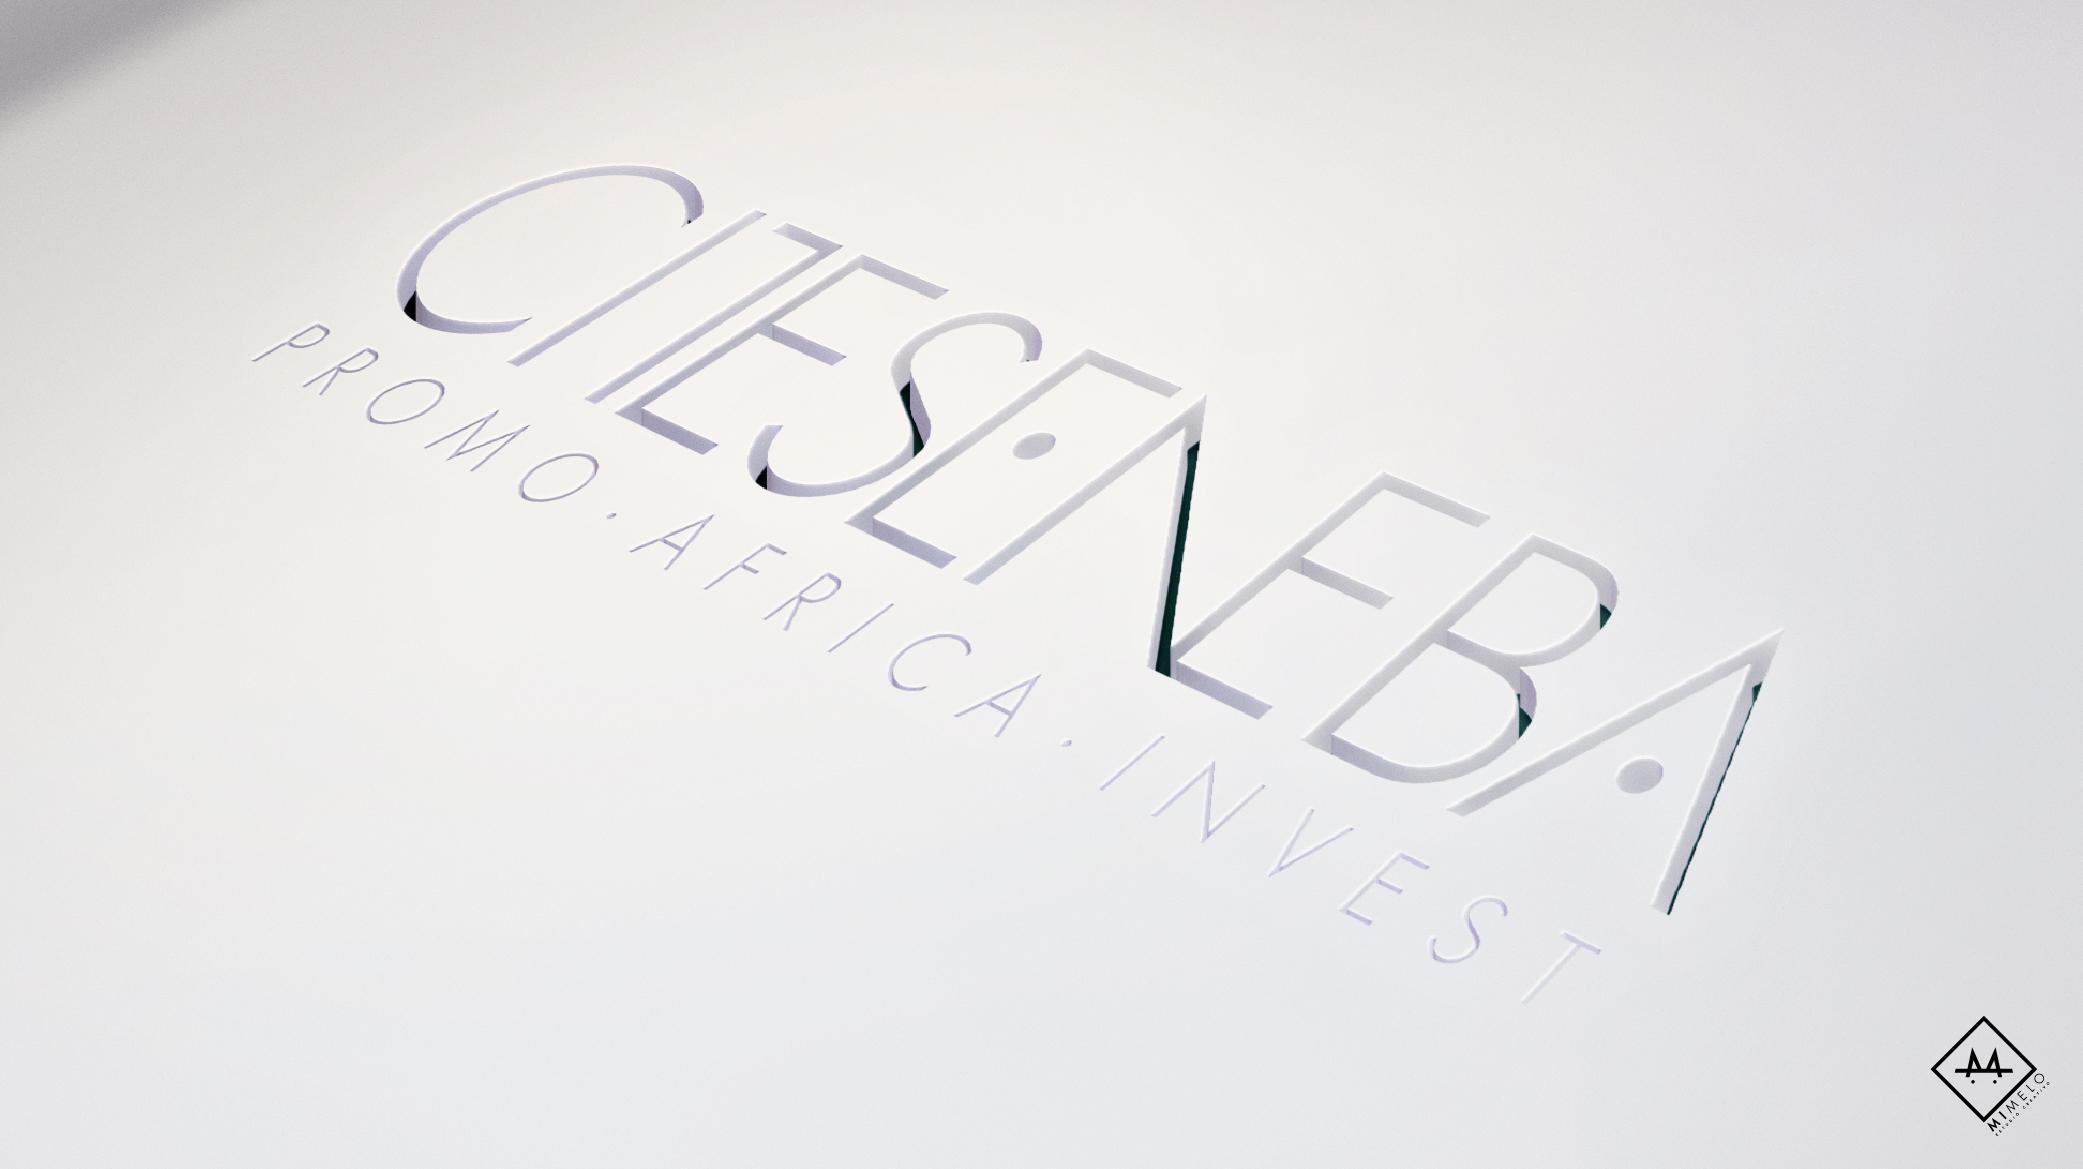 Cite Seneba - Mimelo Estudio Creativo